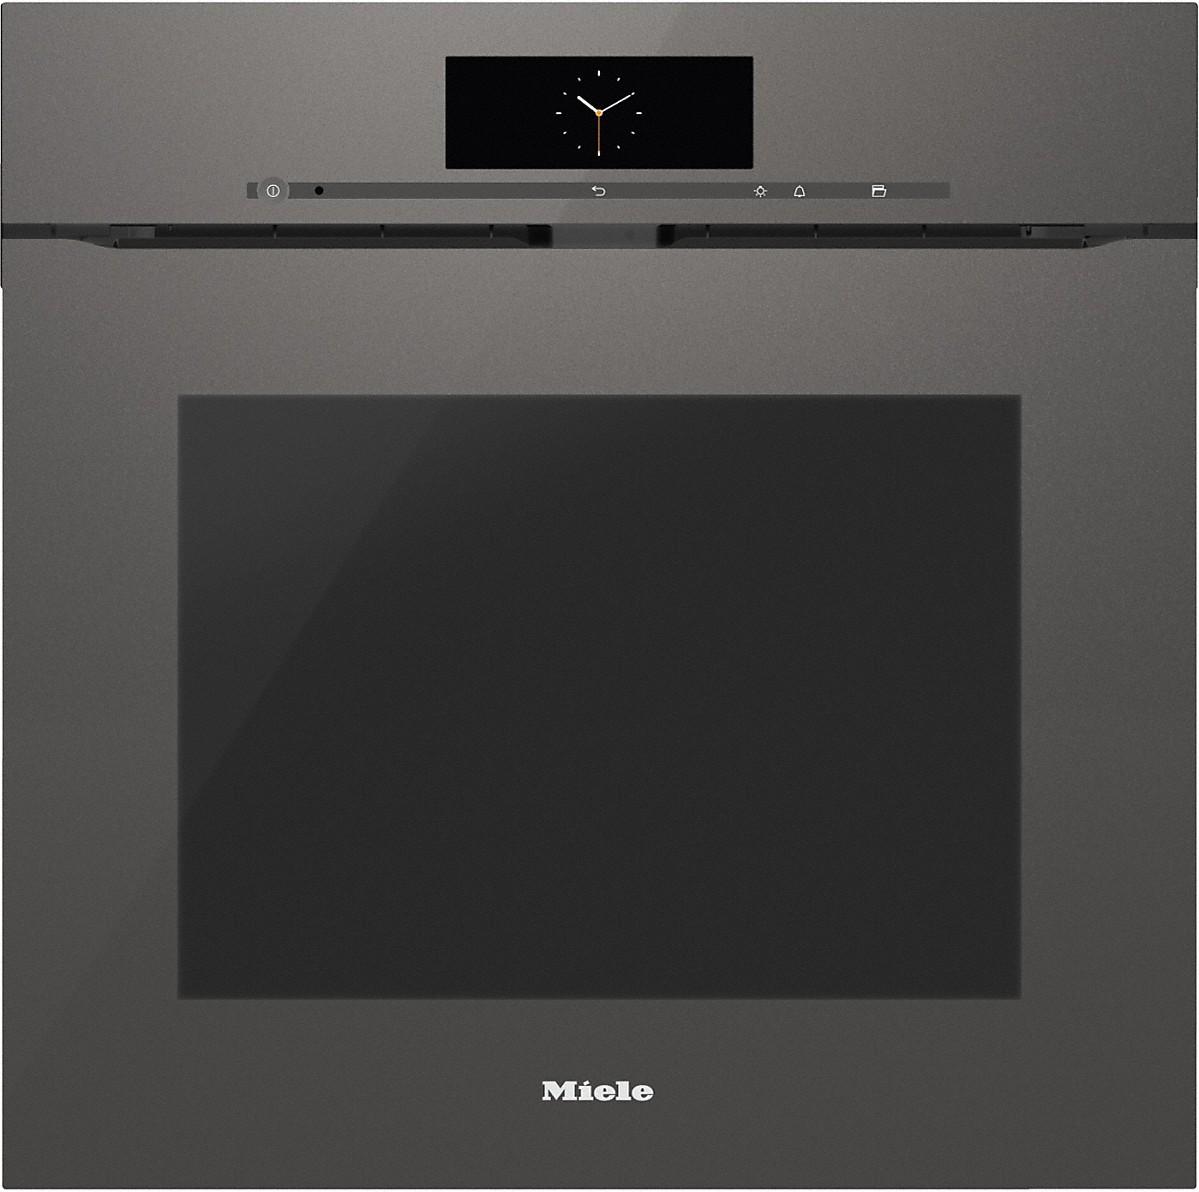 miele microwave combination oven manual